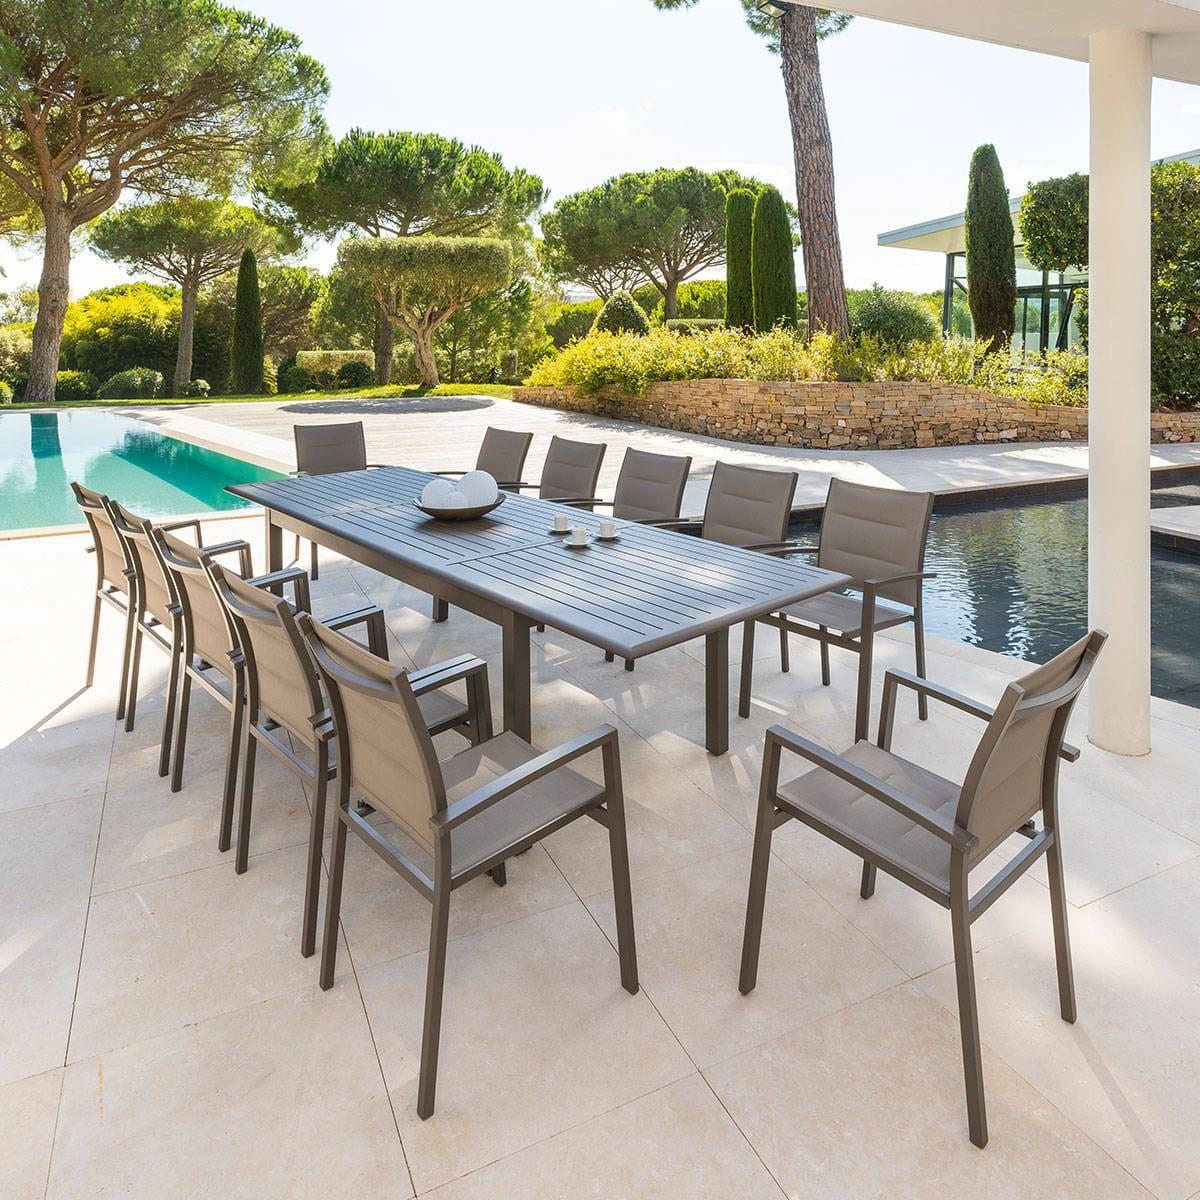 Table De Jardin Extensible Azua Tonka 12 Places - Aluminium ... dedans Hesperides Mobilier Jardin